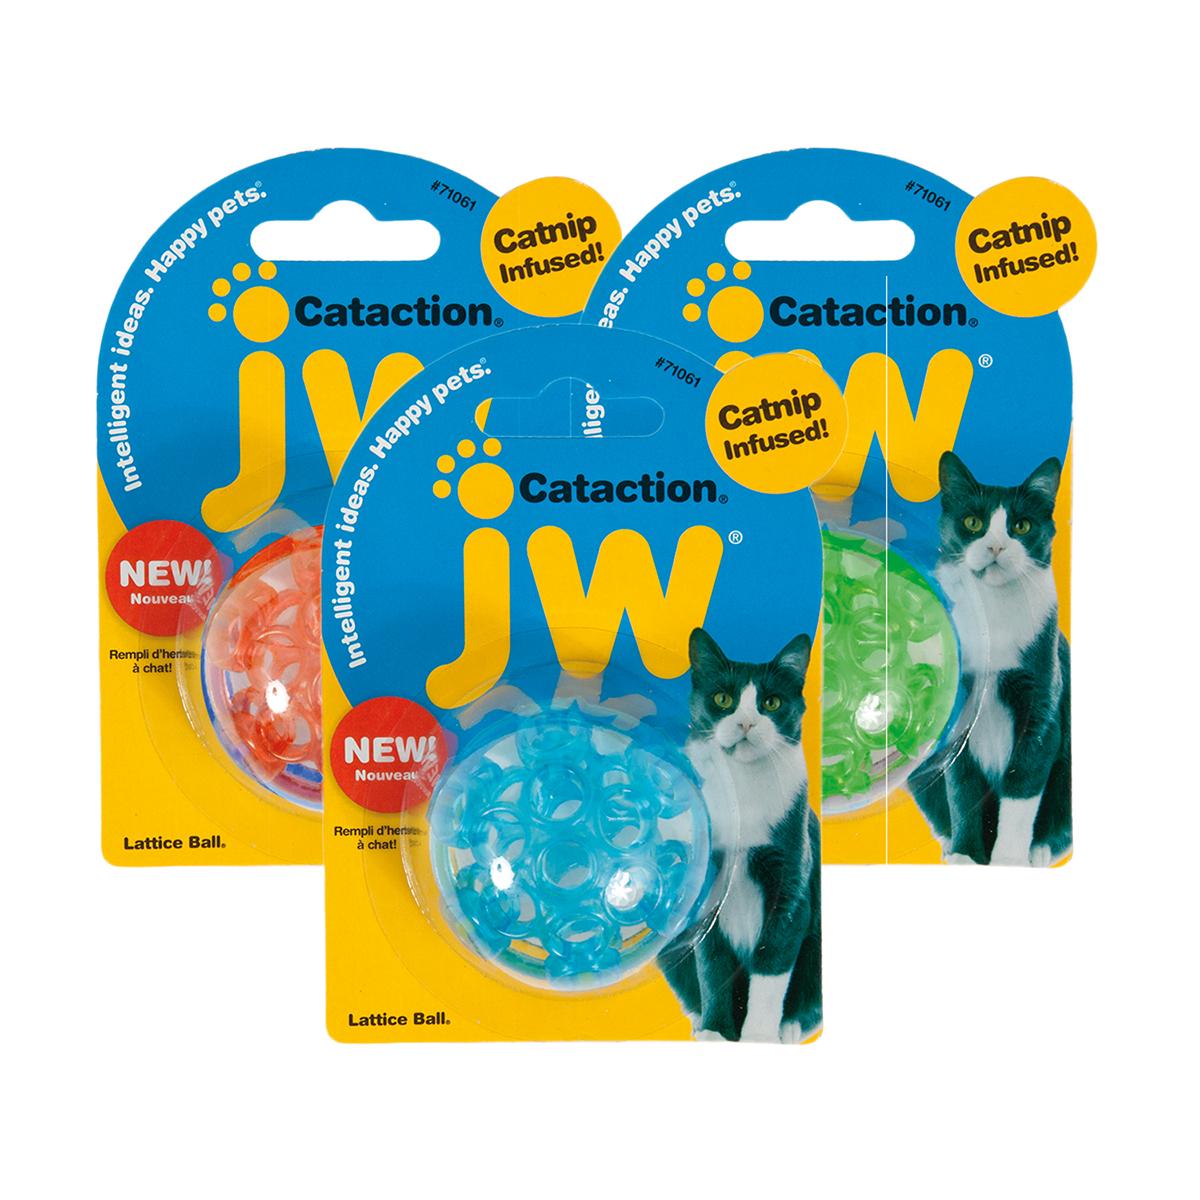 JW CATACTION LATTICE BALL 00001